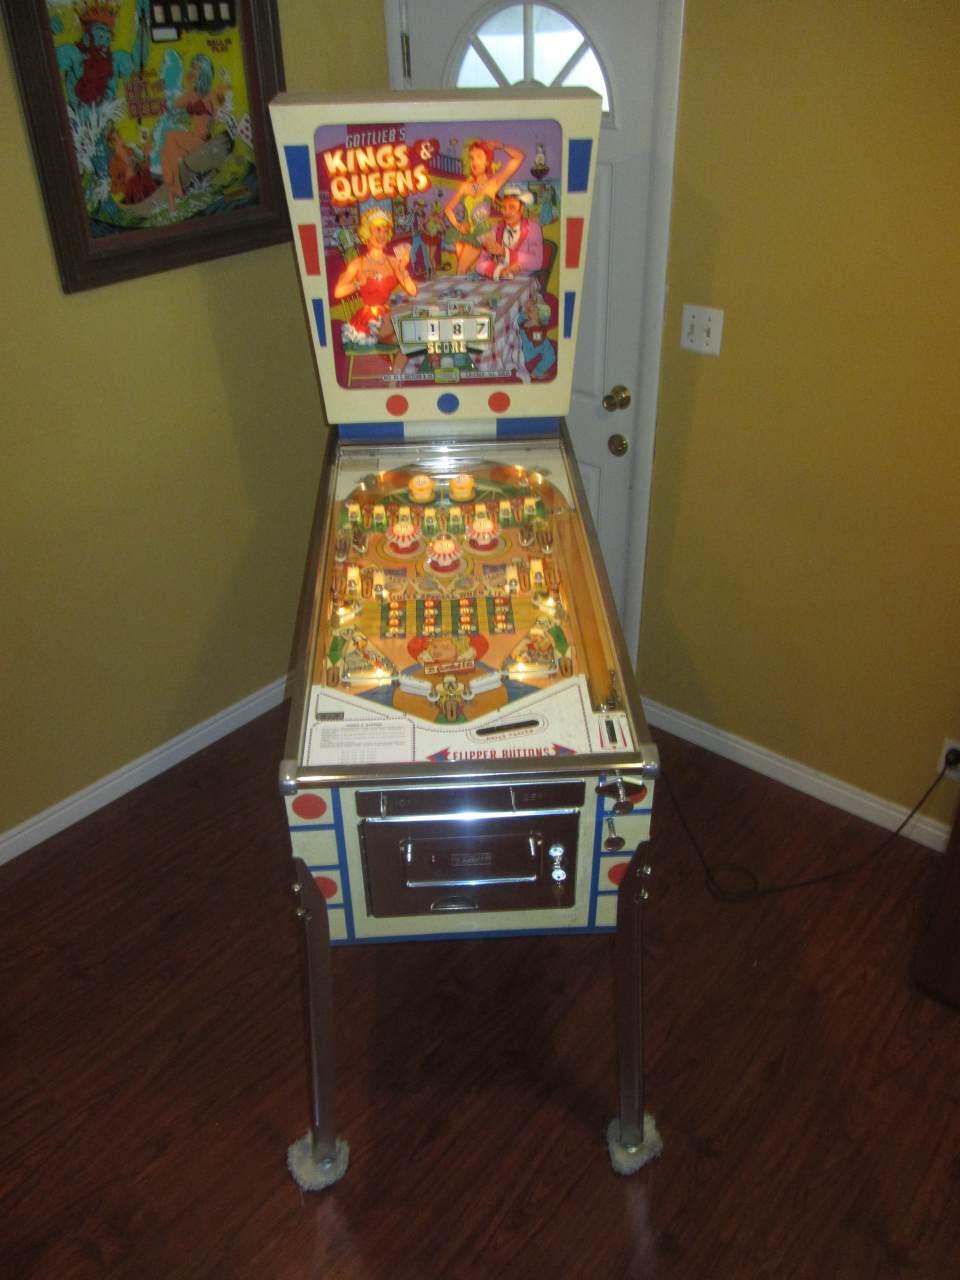 Gottlieb Kings and Queens Pinball Machine #1 - Pinballmania LLC